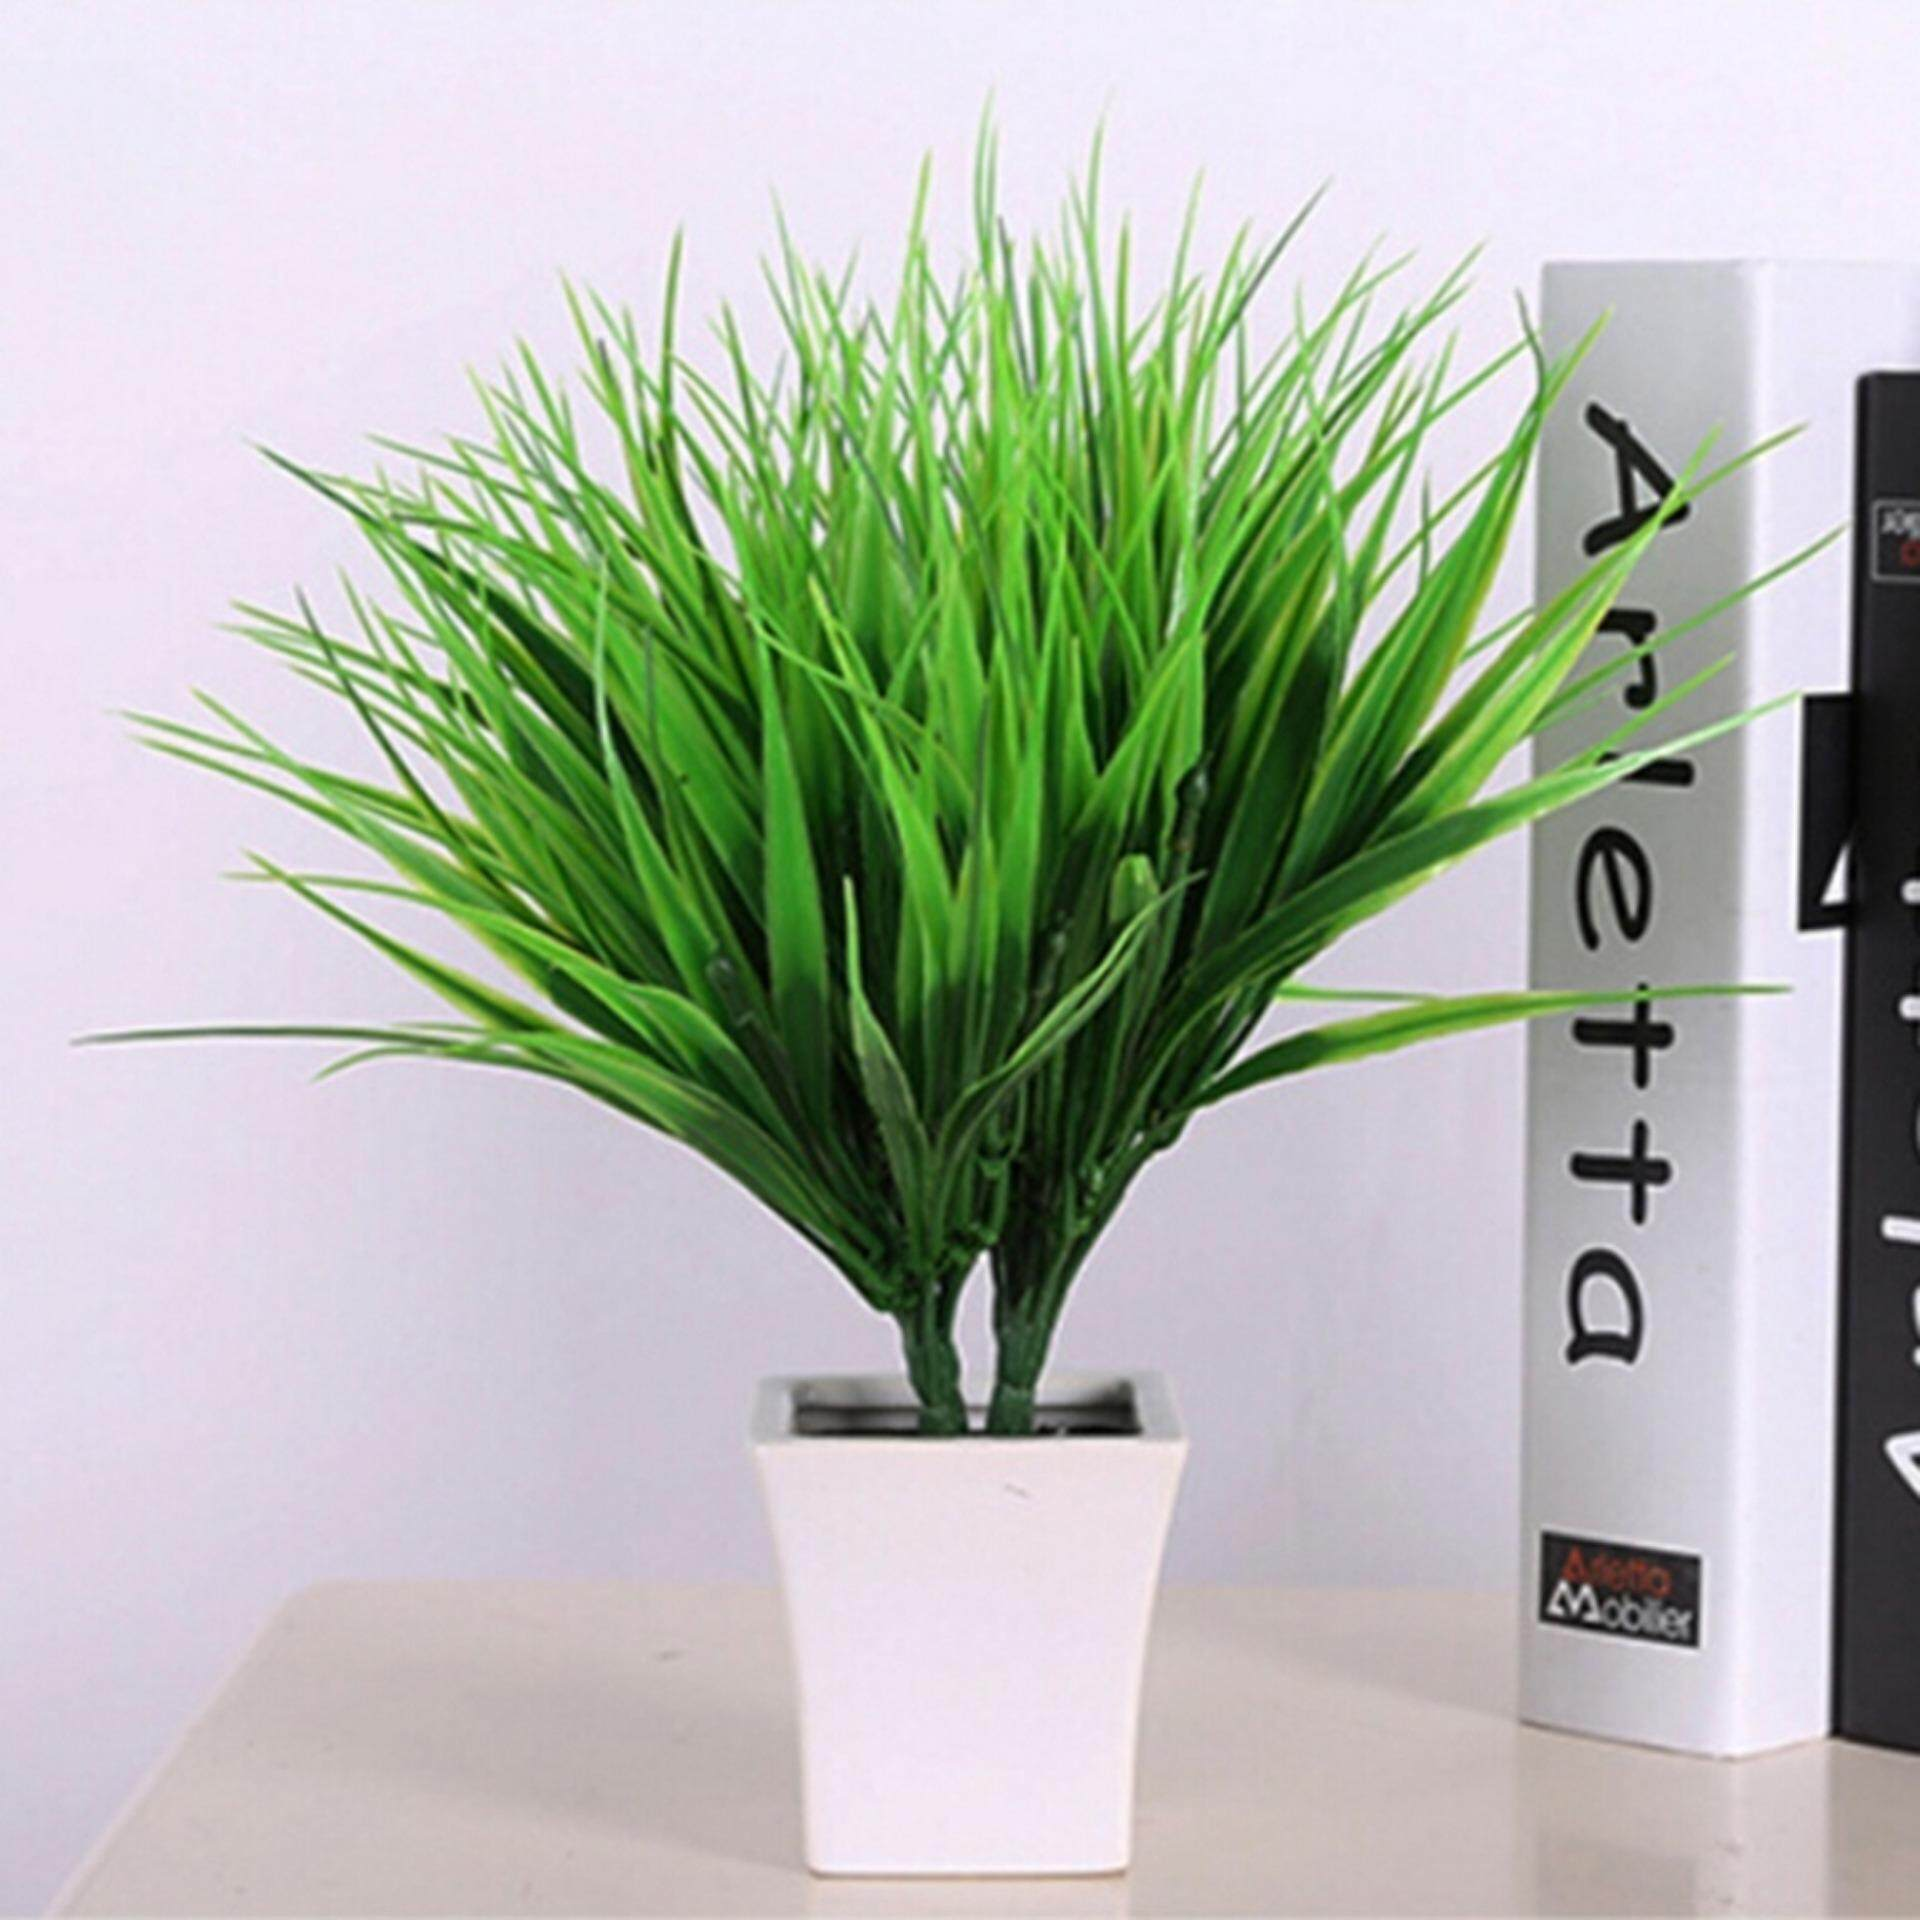 Rp 26.000. Plastik Palsu Buatan Hijau Tanaman Rumput Bunga ... 1b21354c7d